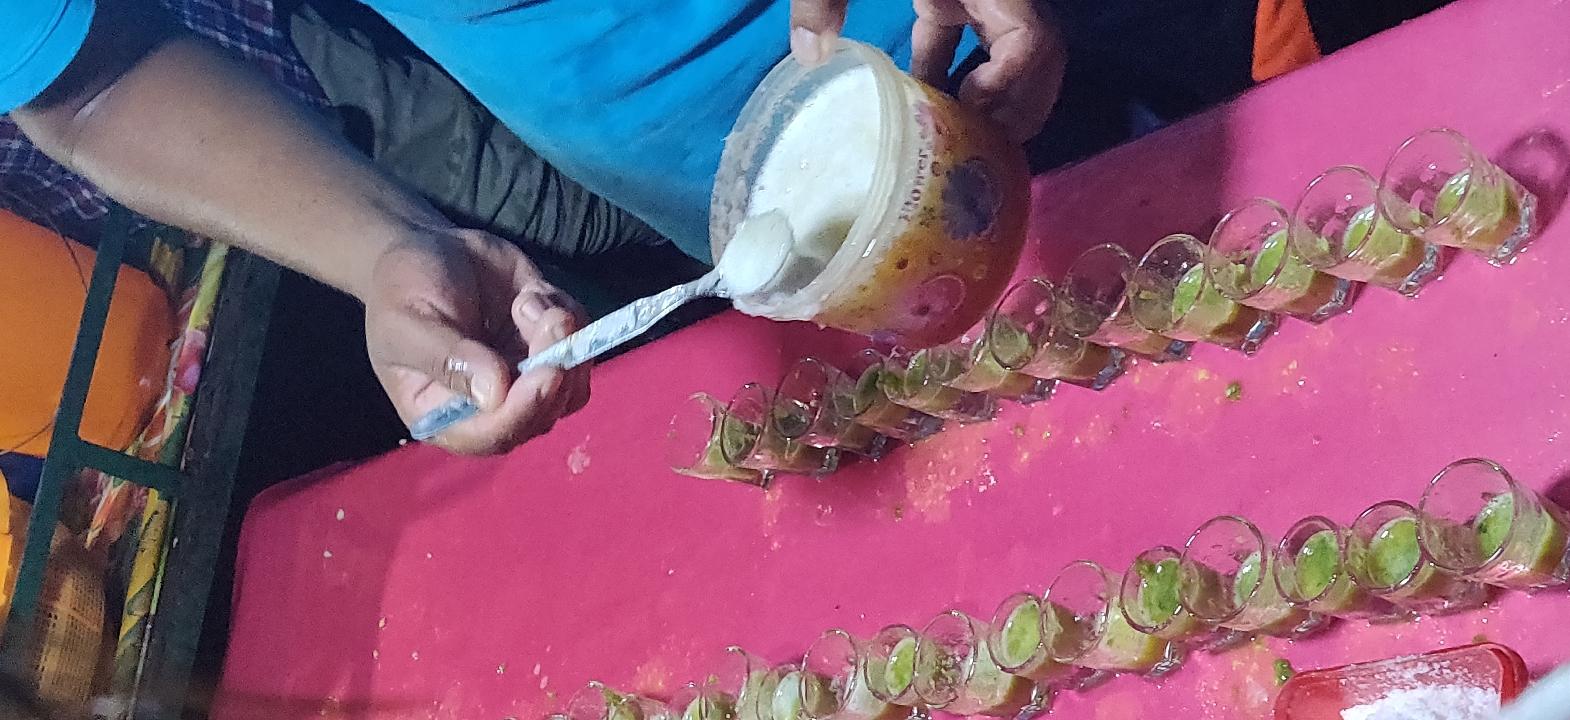 #street food#trending soda